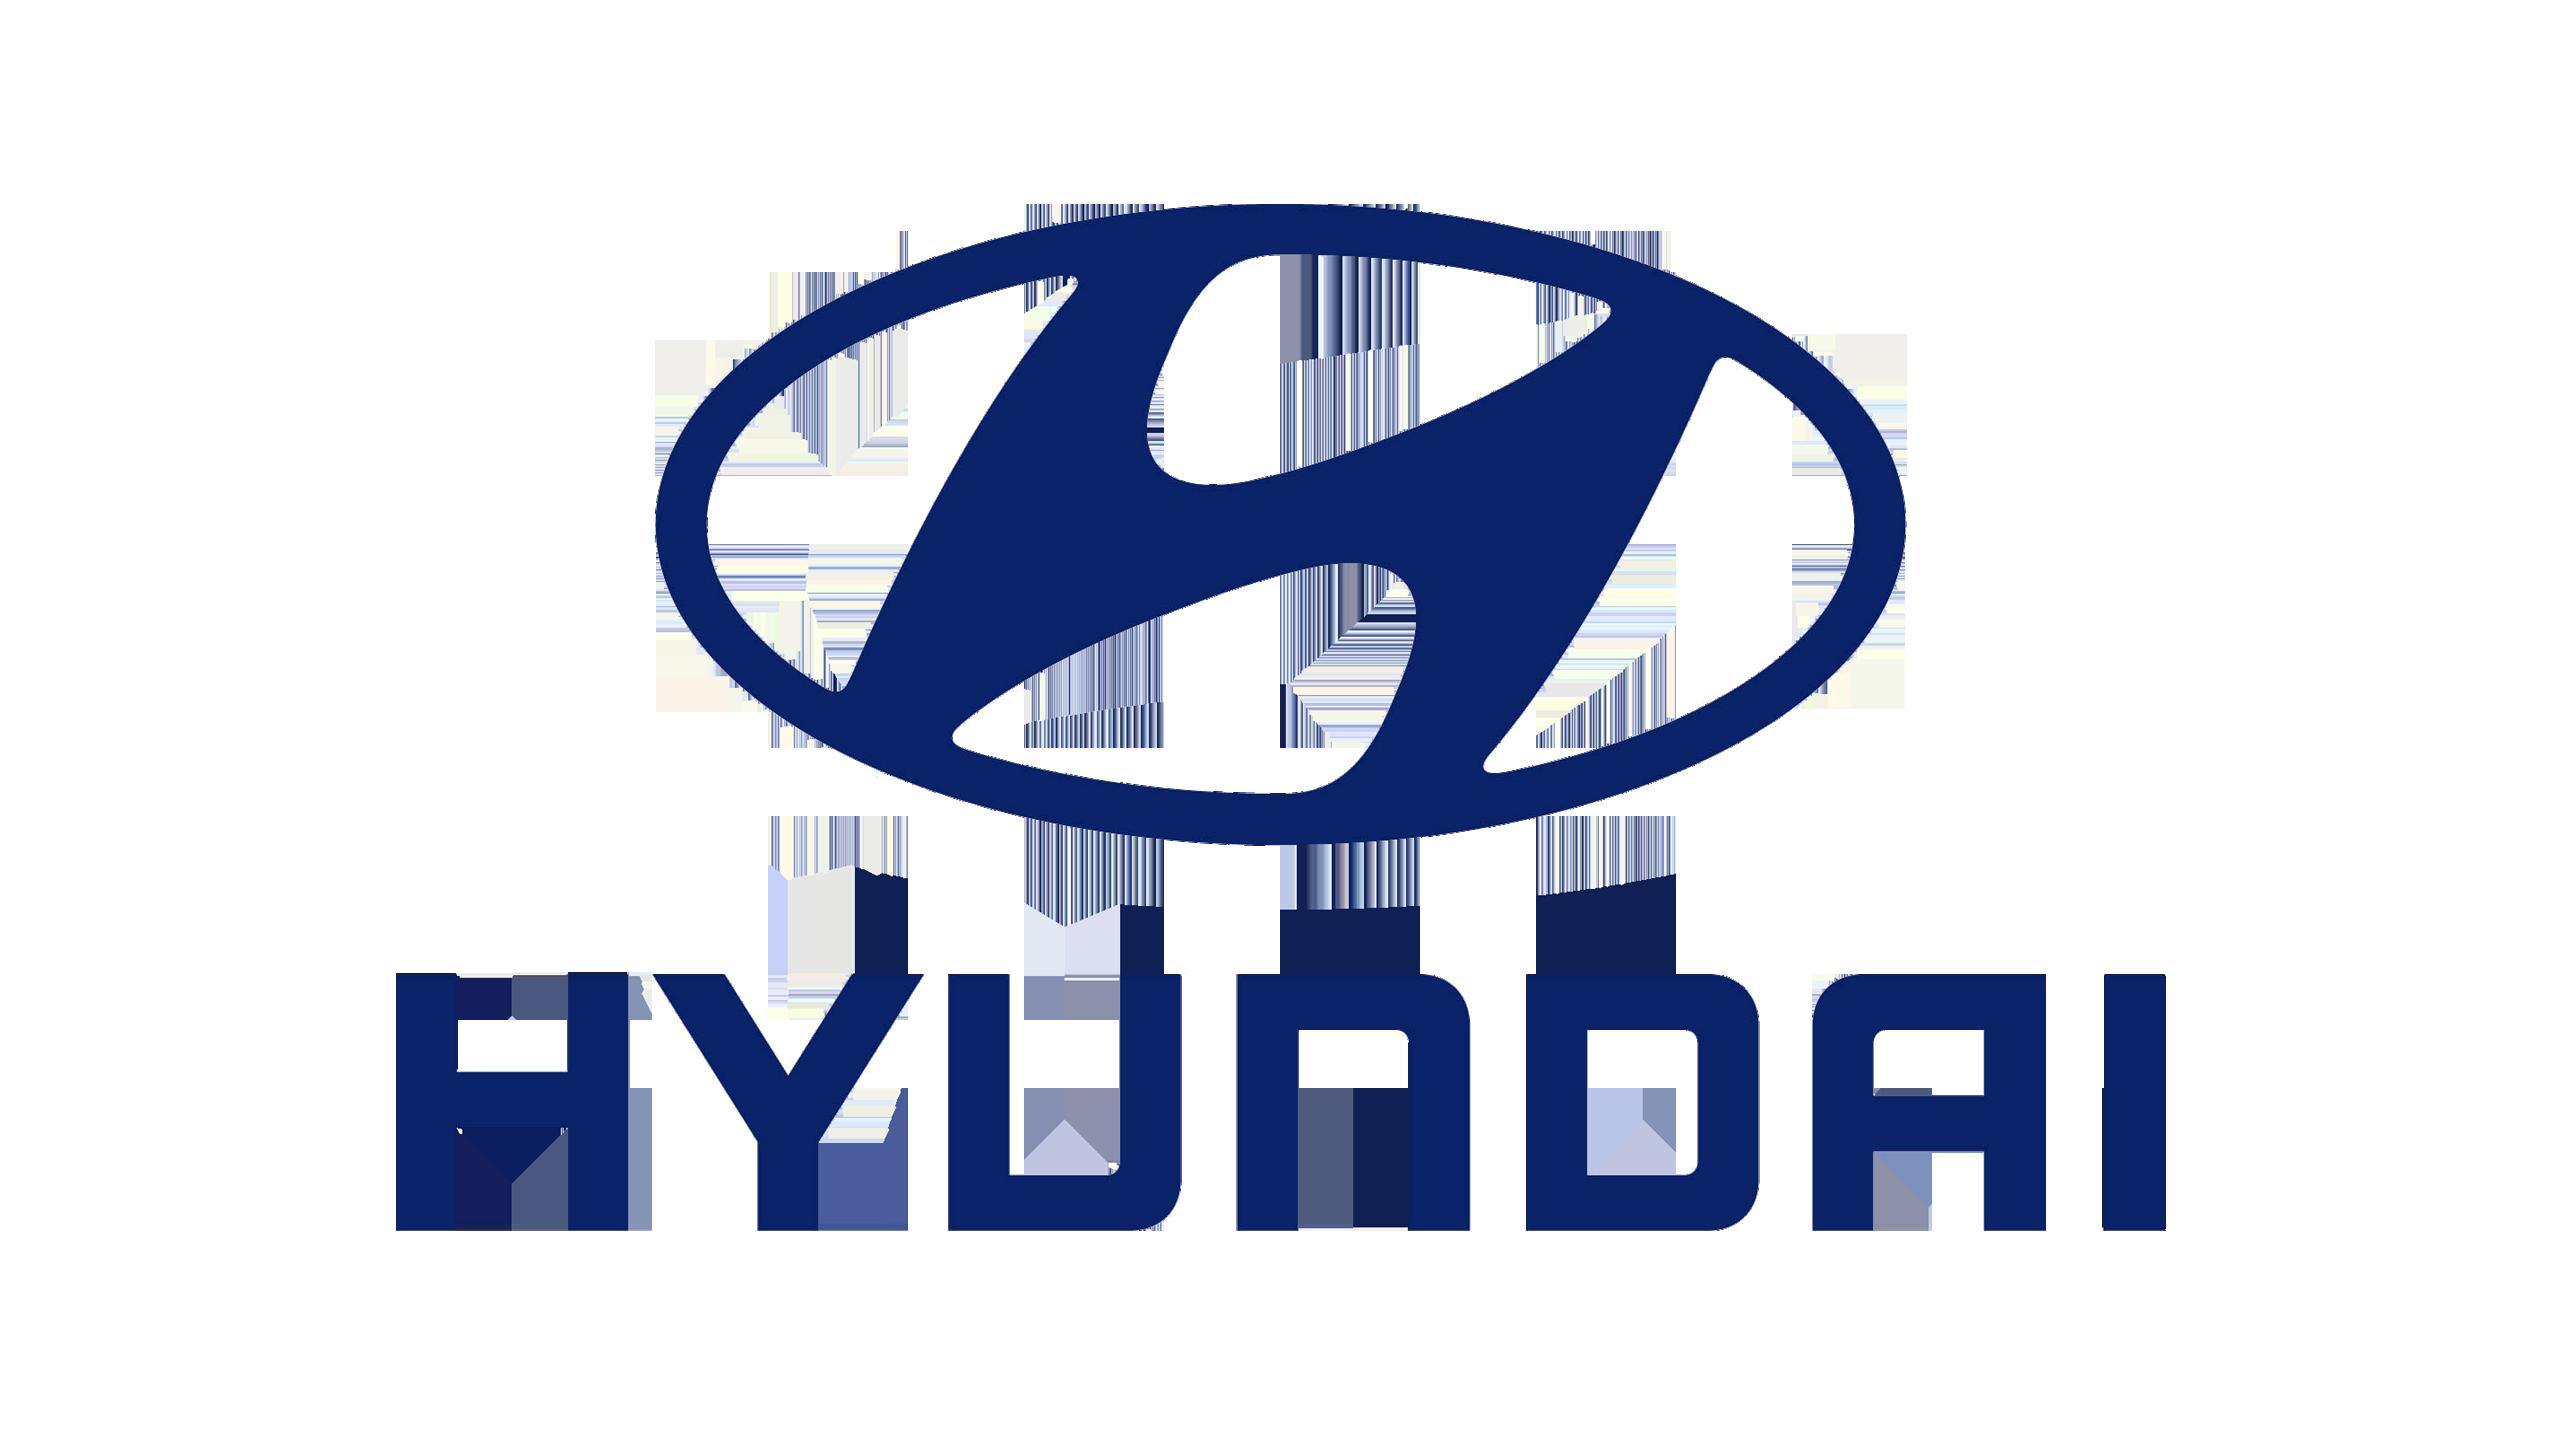 Marshall Hyundai Cambridge